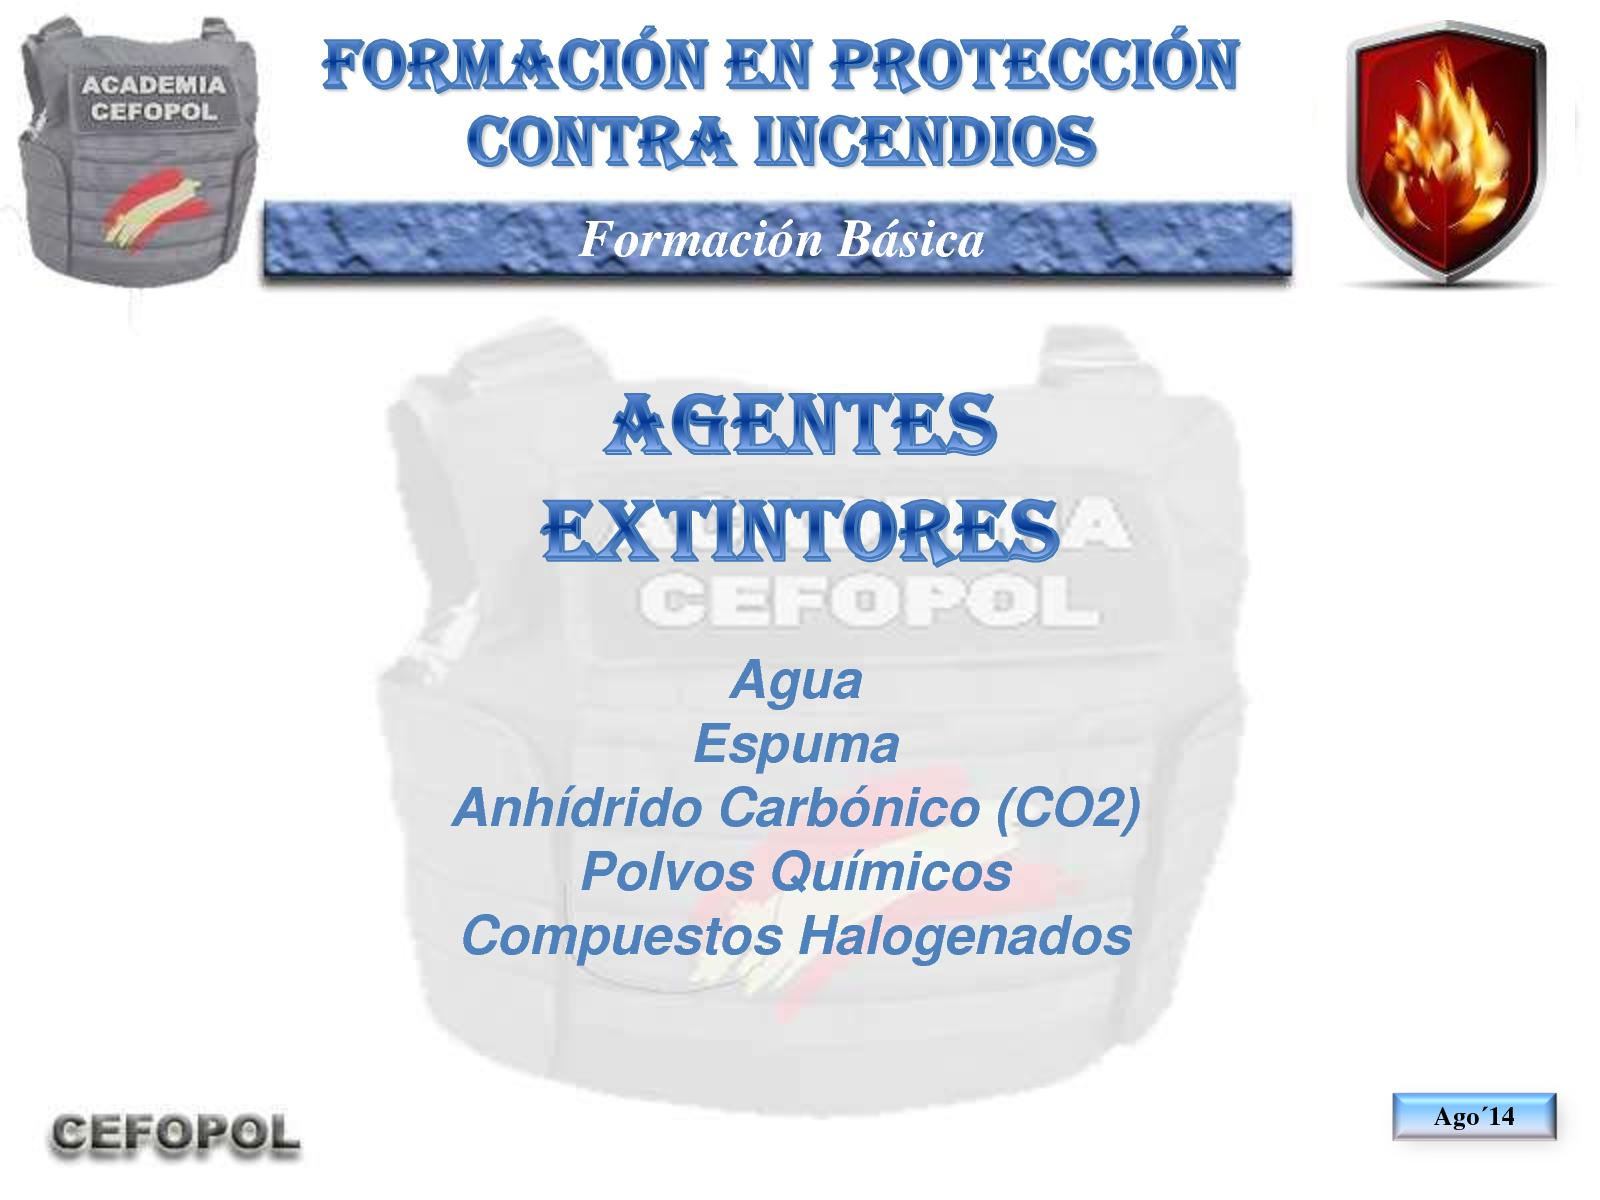 PCI 40 - Agentes Extintores